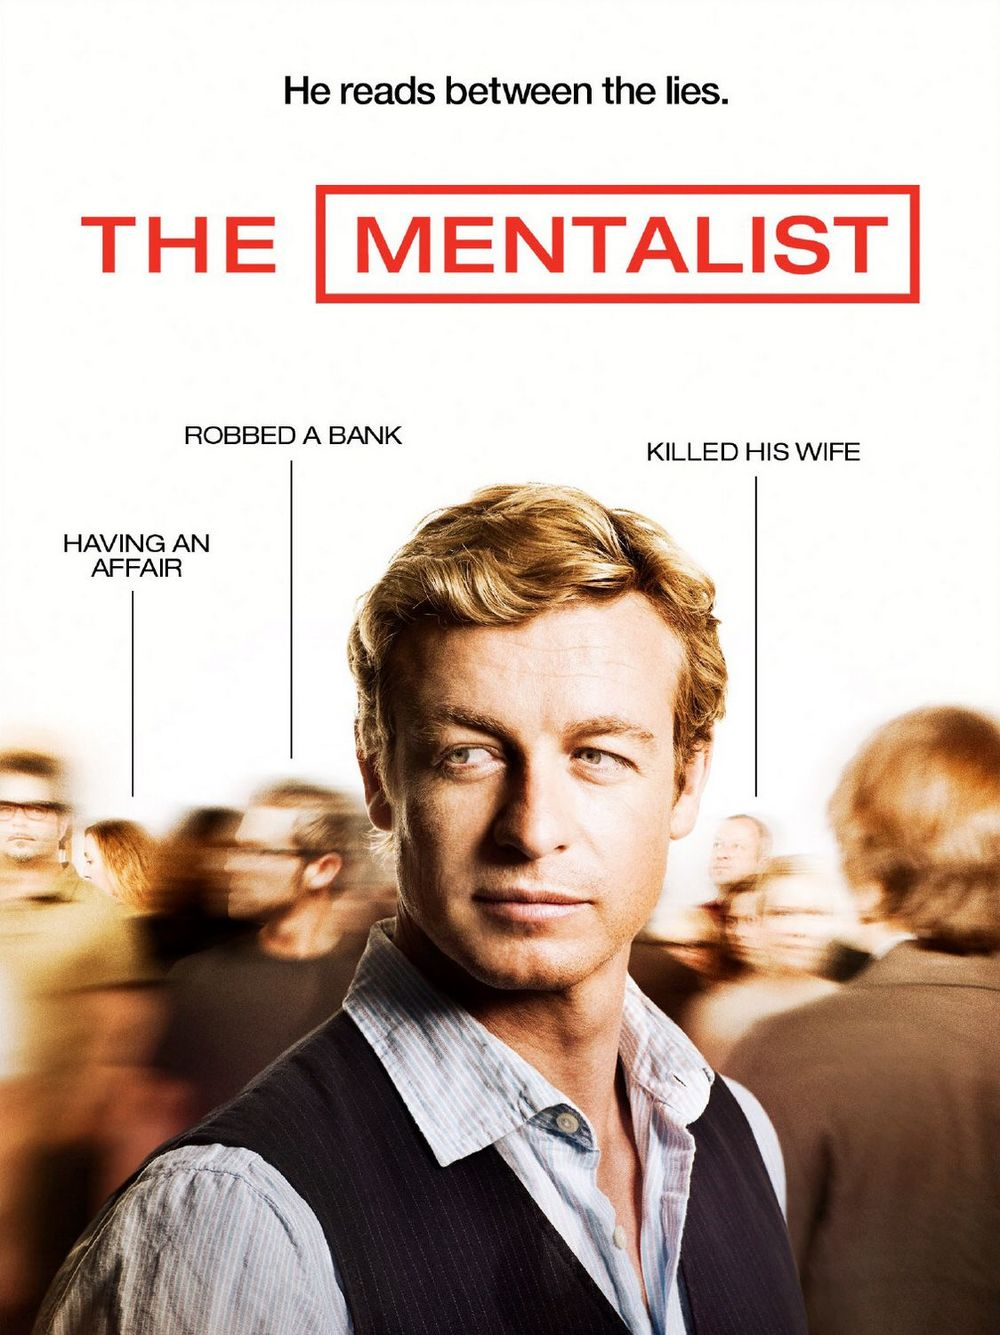 Poster-the_mentalist-cbs.jpg